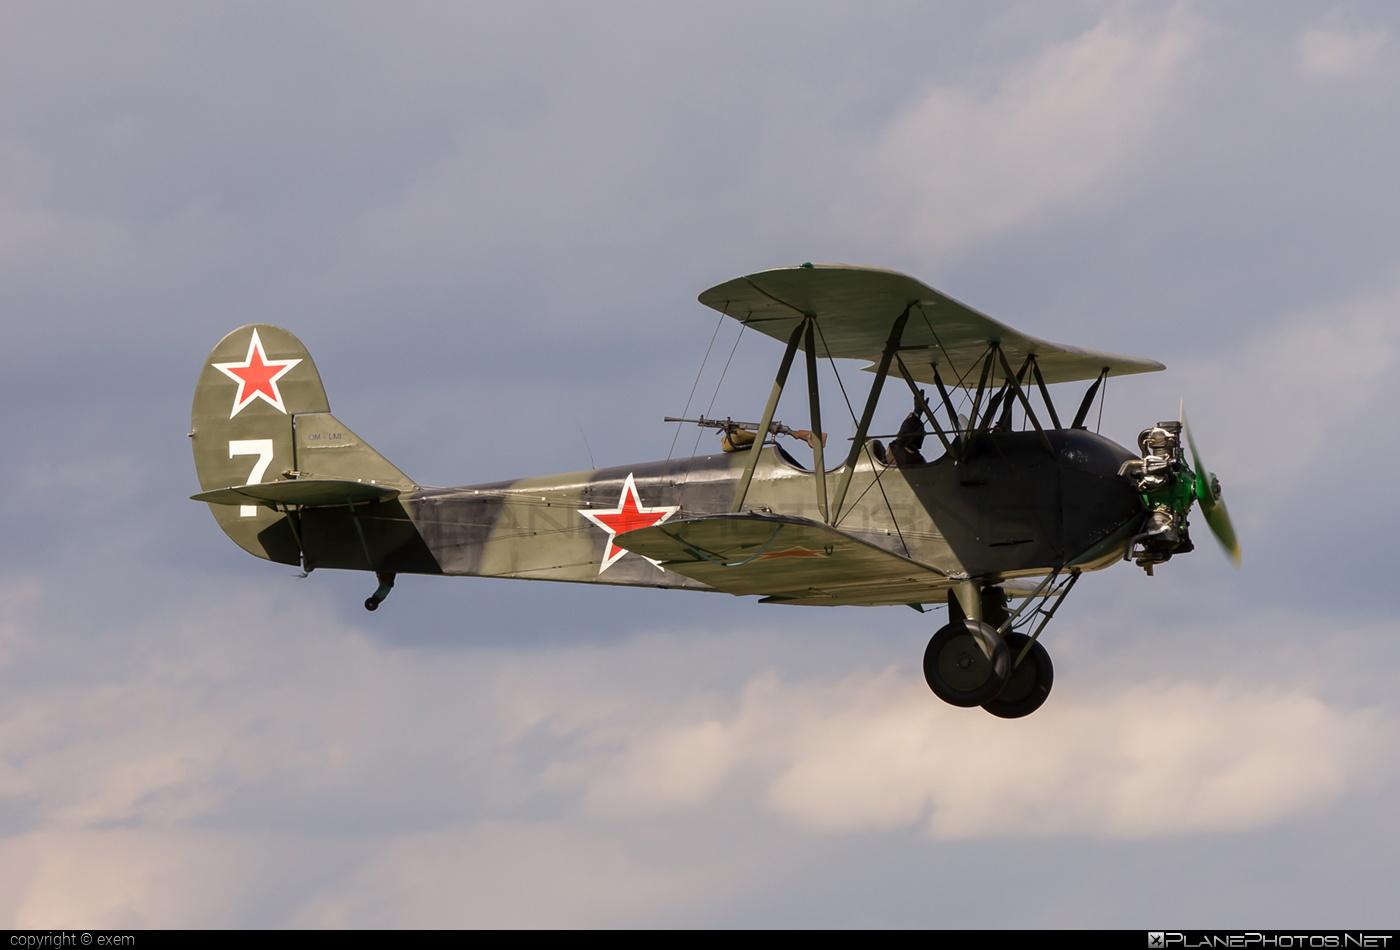 Polikarpov Po-2 Kukuruznik - OM-LML operated by Slovak Technical Museum Košice #kukuruznik #polikarpov #polikarpov2